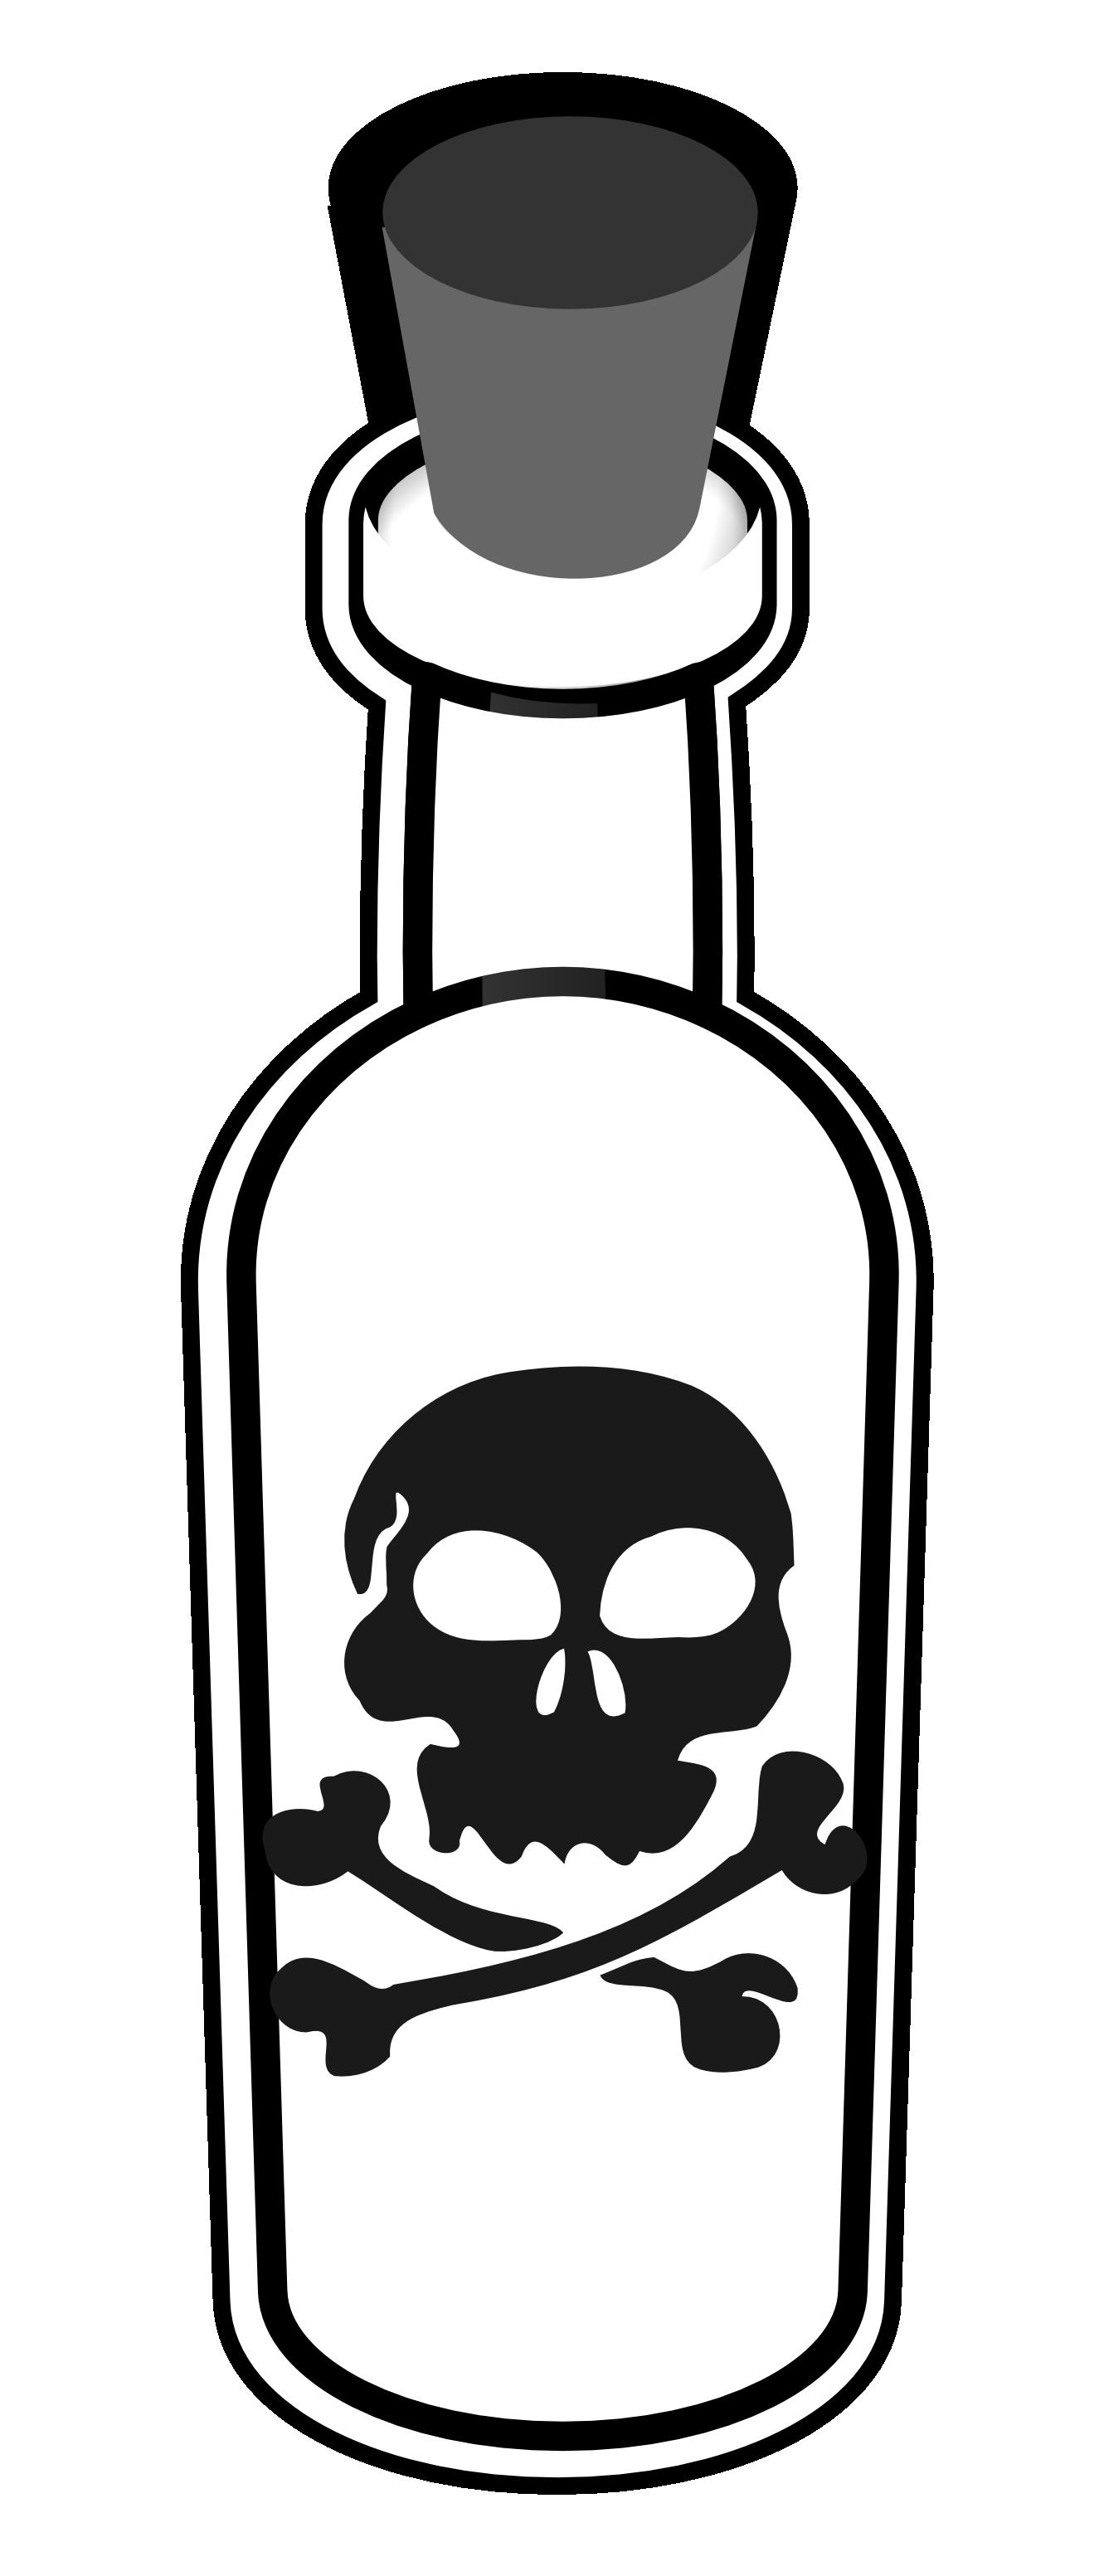 Poison panda free images. Gas clipart jug